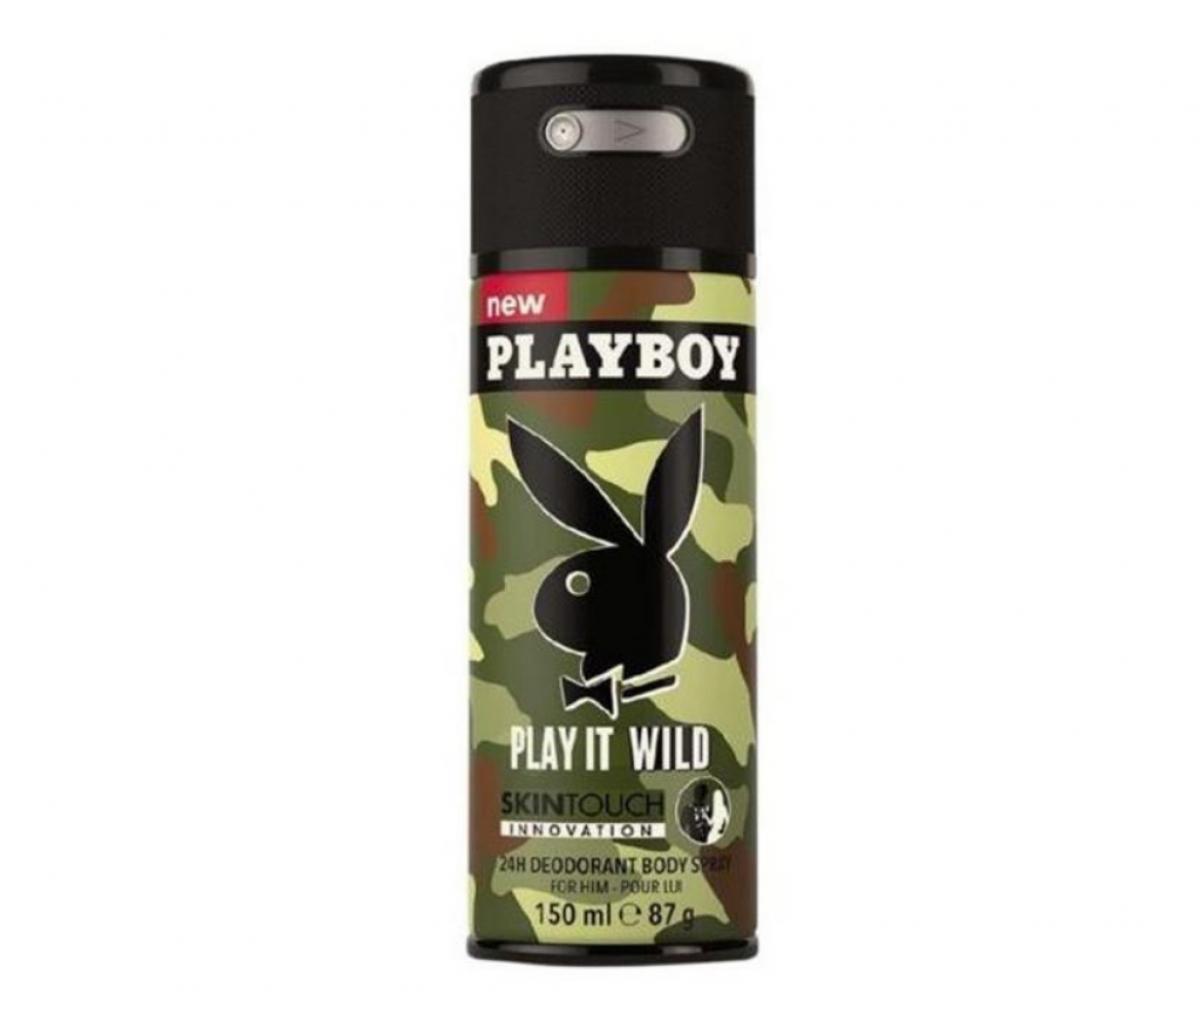 Playboy Deo 150ml Play It Wild